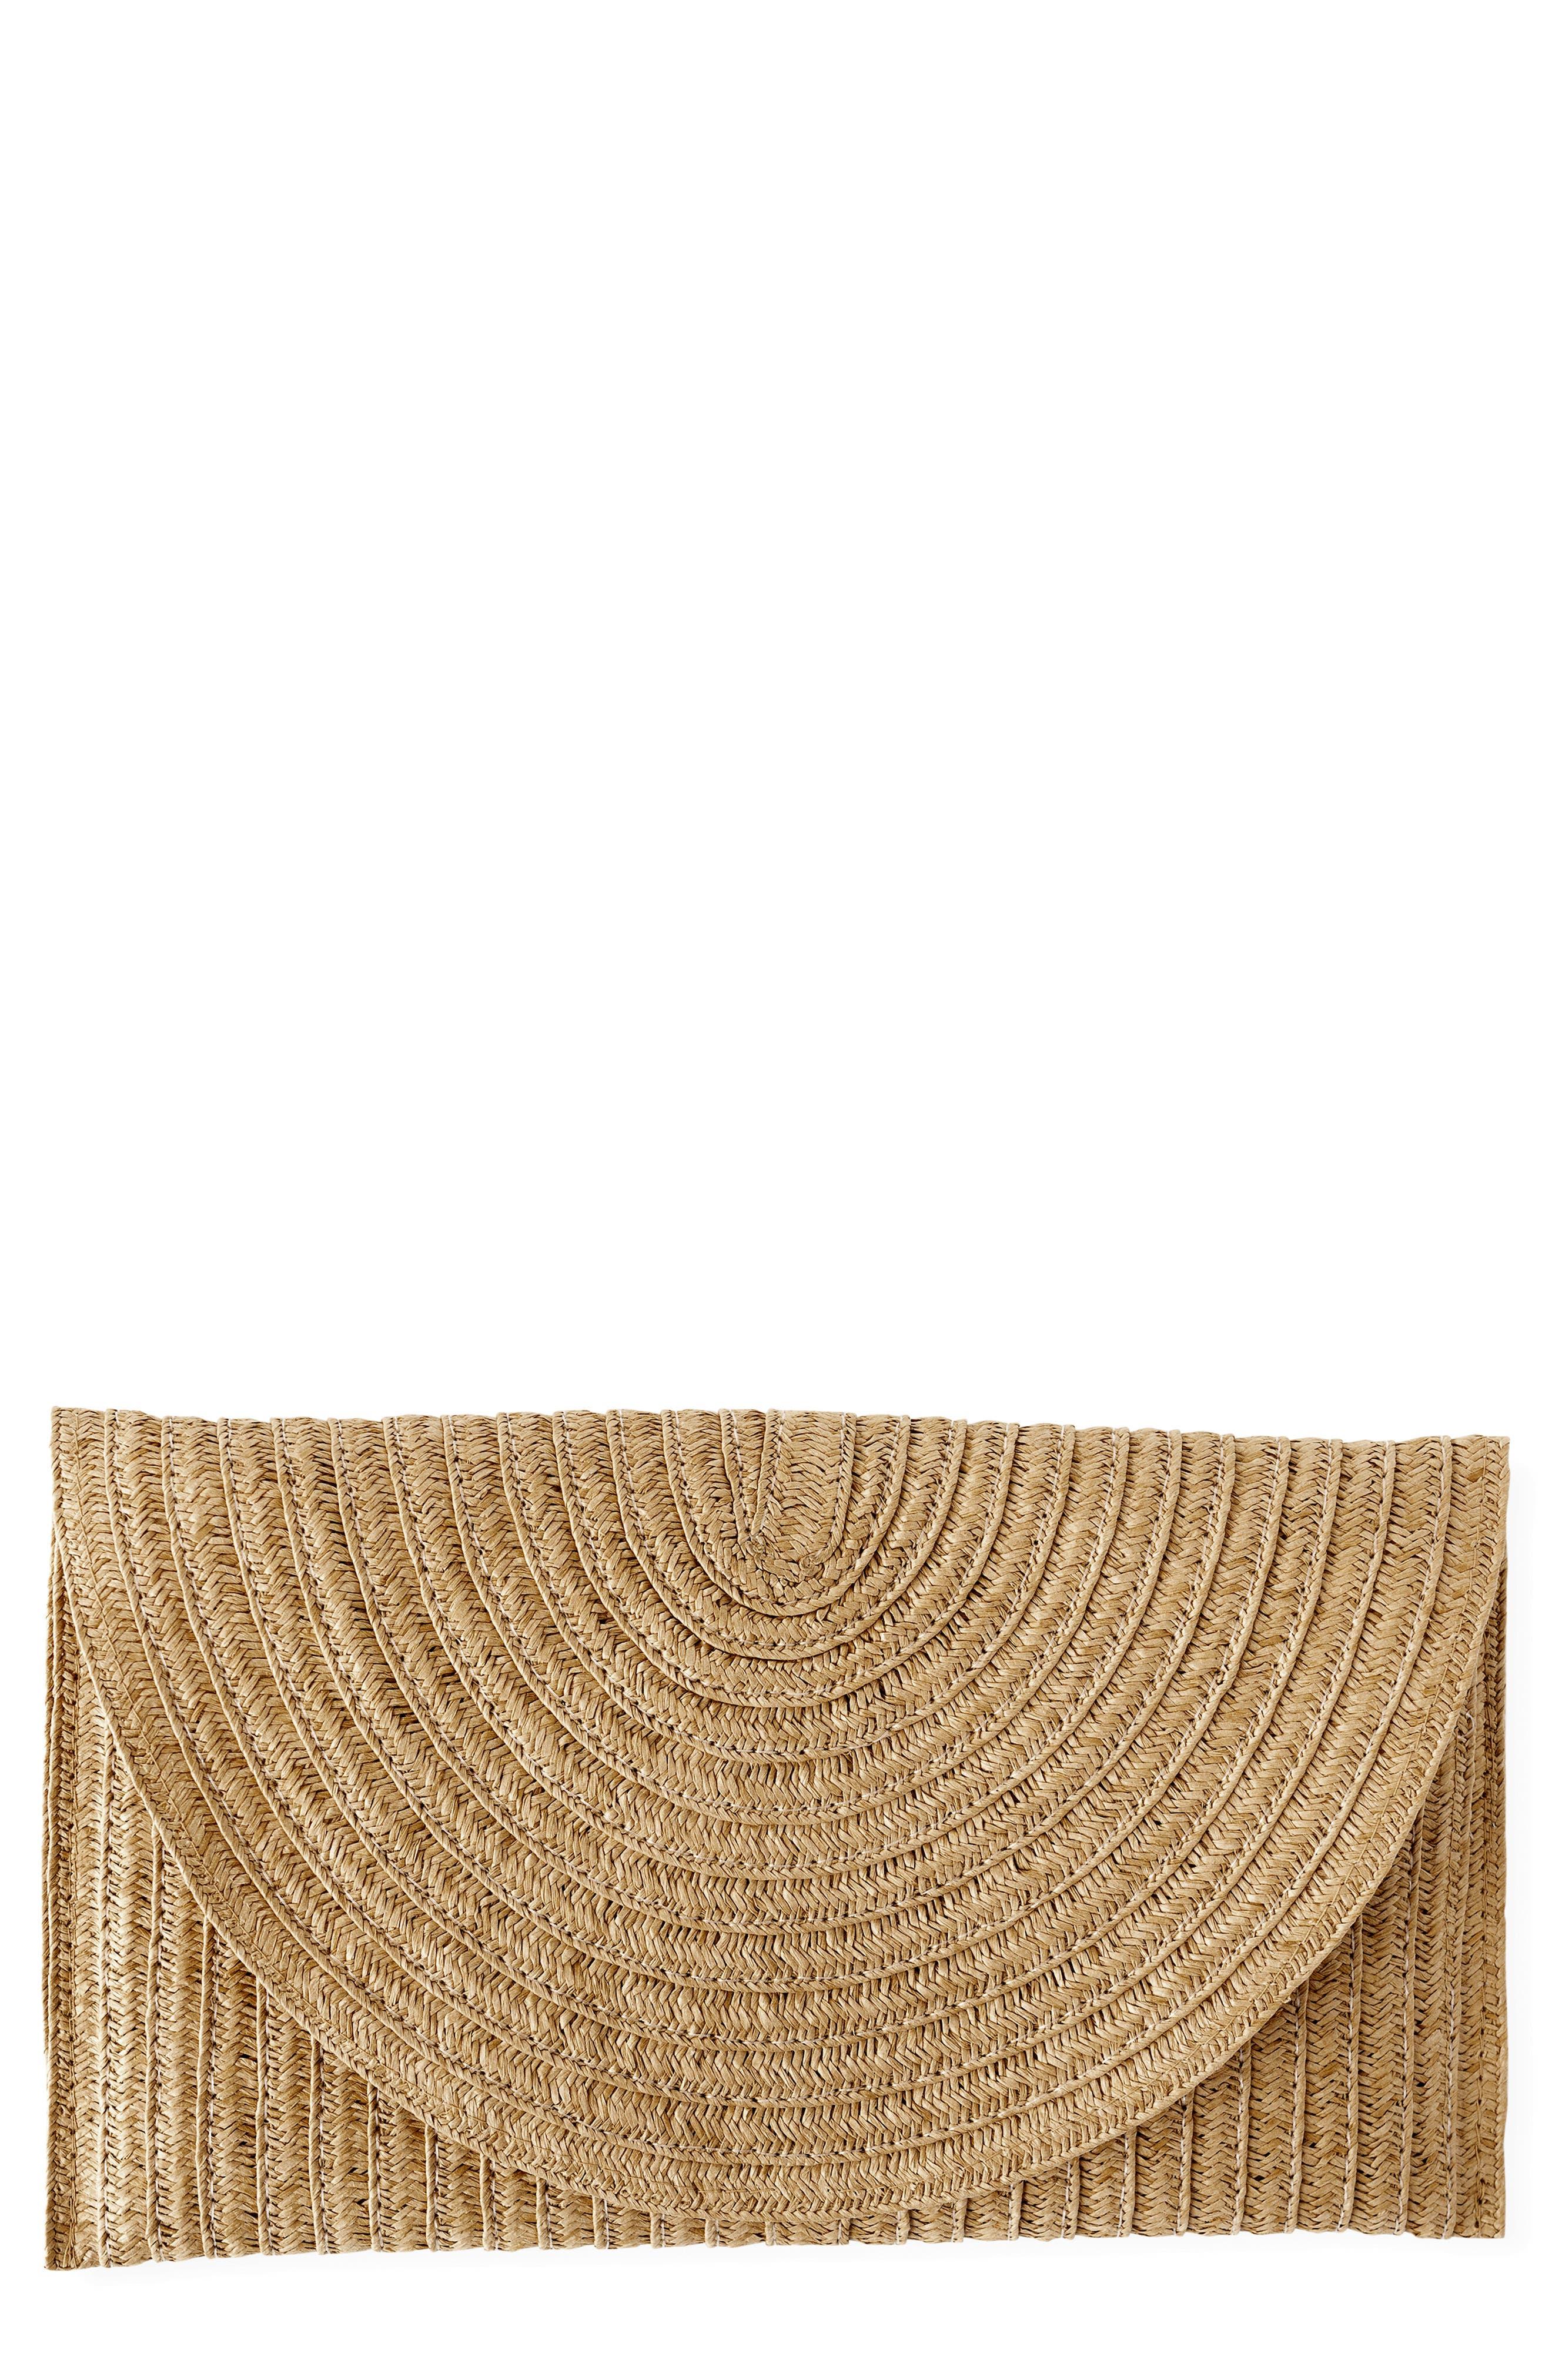 Monogram Straw Envelope Clutch, Main, color, BROWN